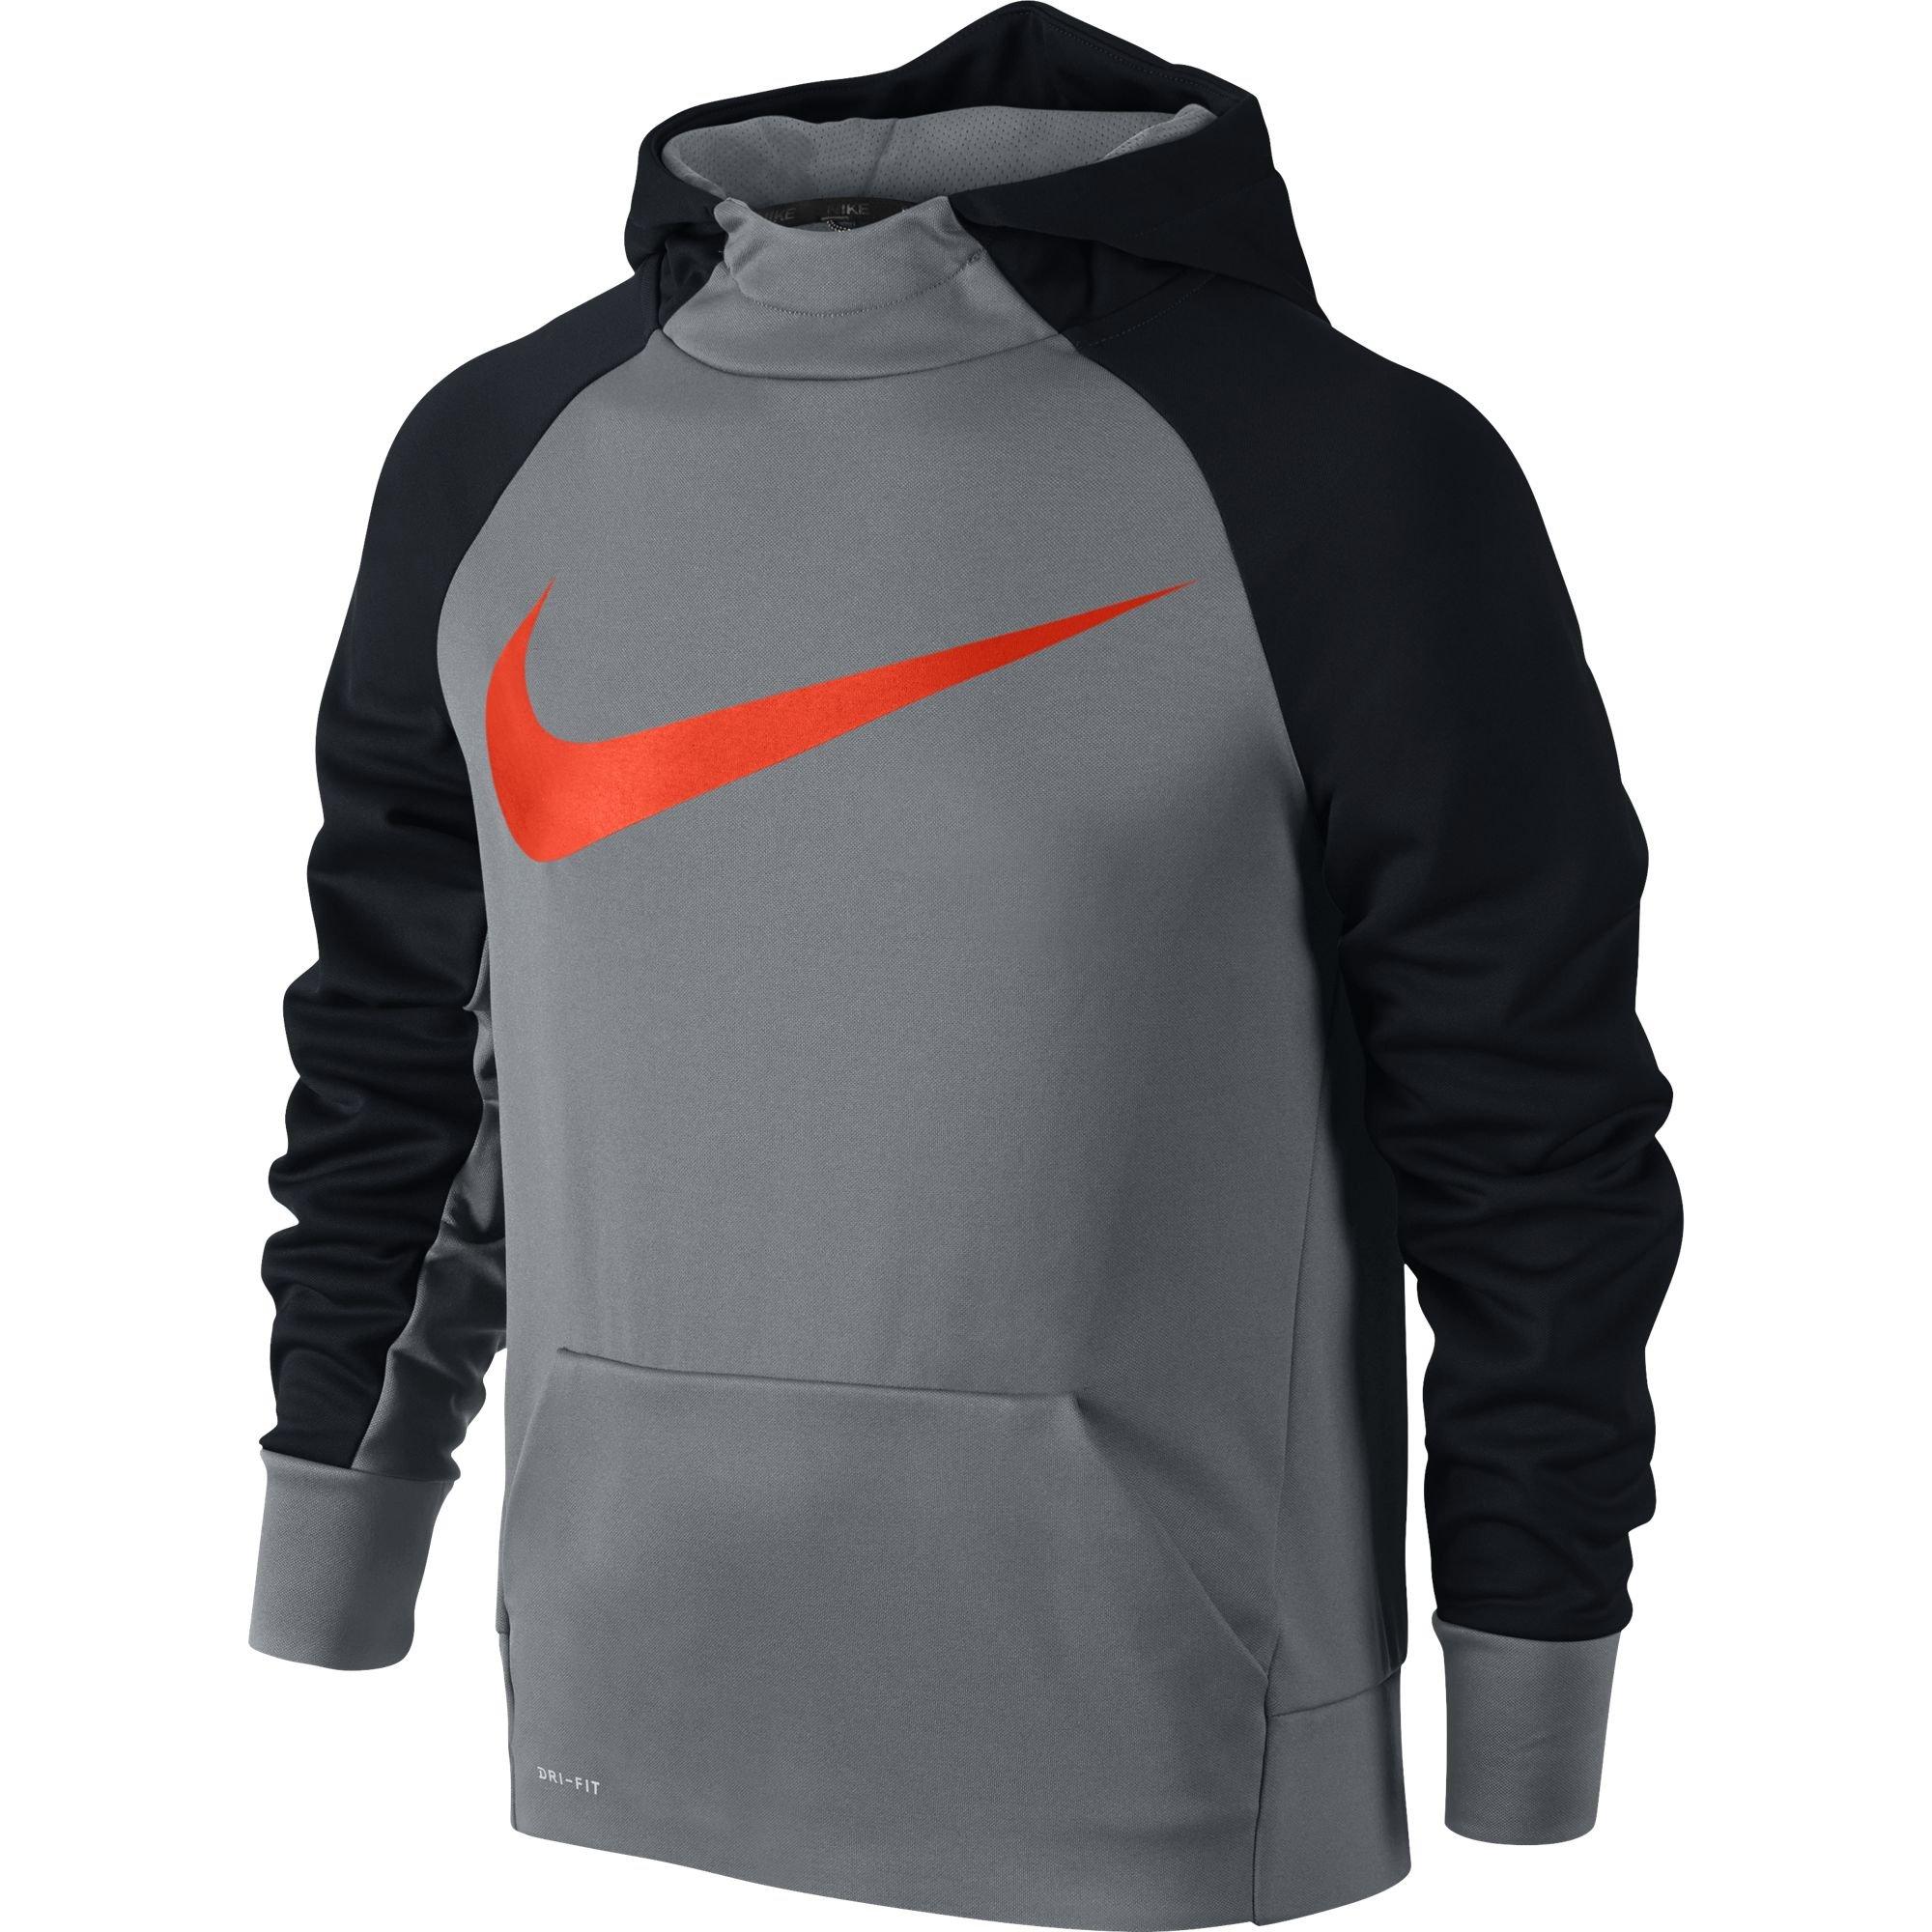 Nike Boy's Therma Training Hoodie Cool Grey/Black/Hyper Crimson Size Small